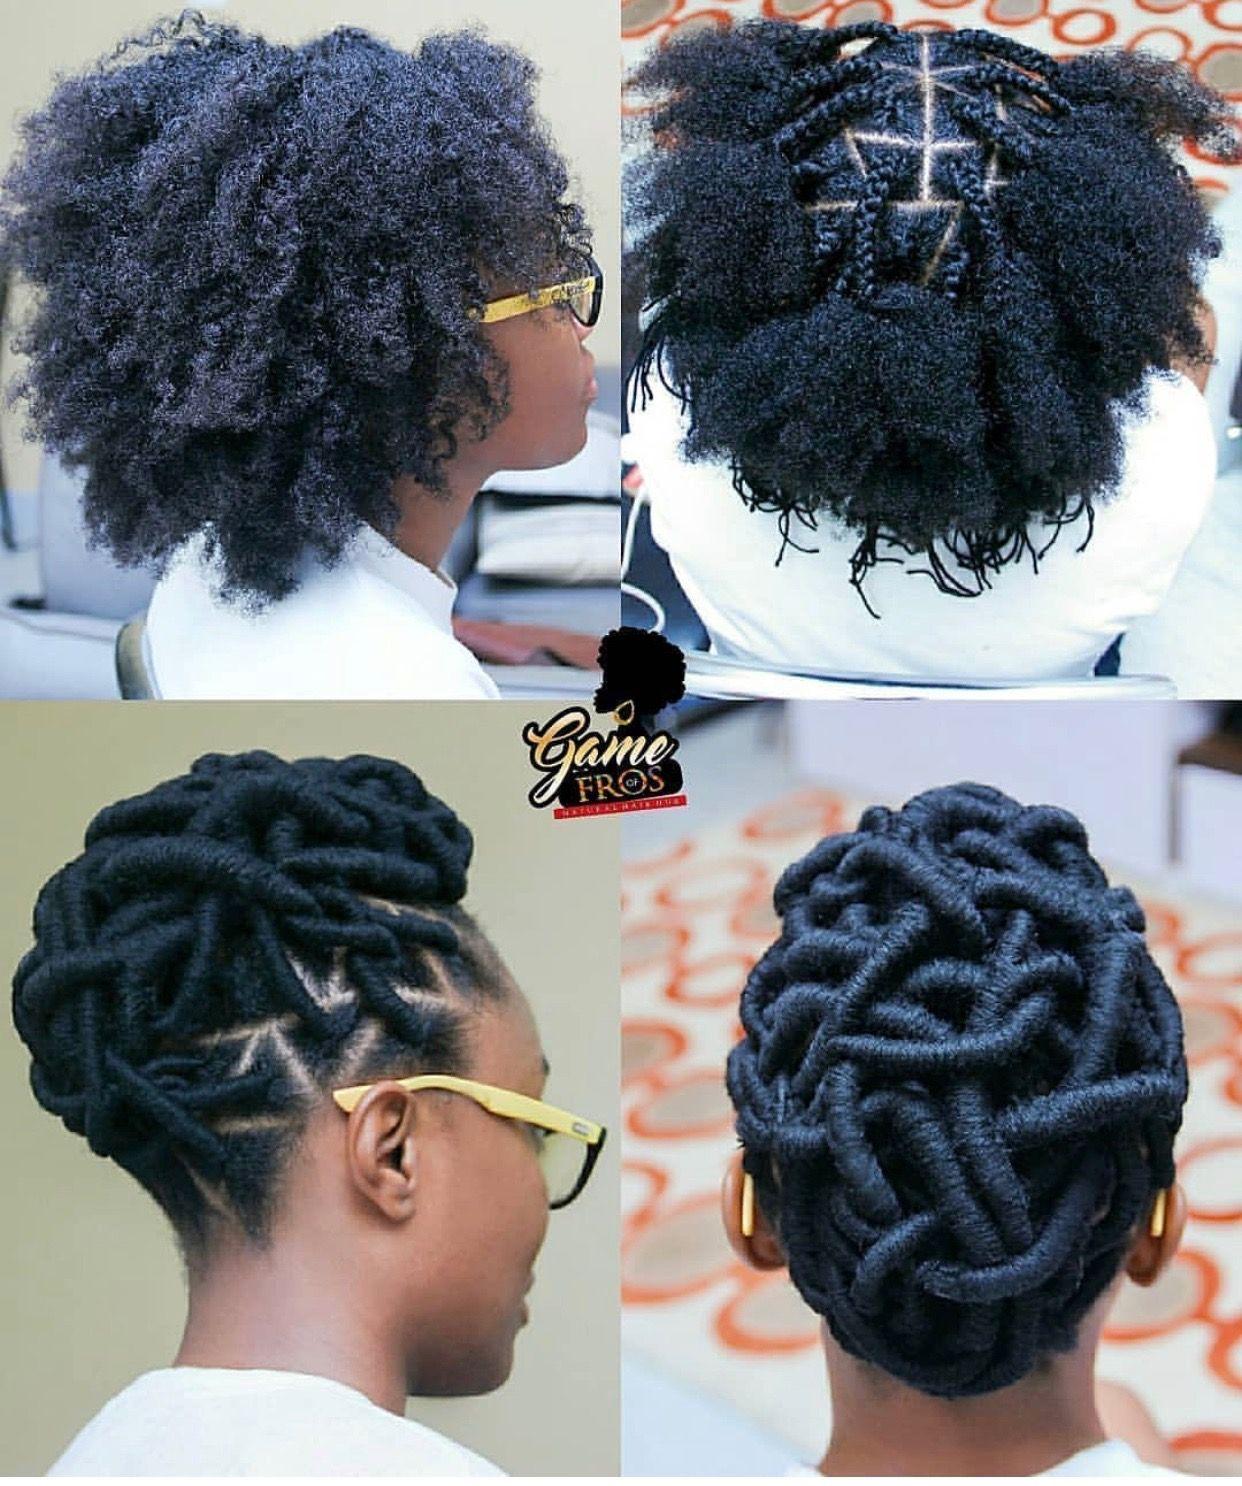 Pin By Cassandra Tidwell On Hair Braids Locs Twists Natural Hair Styles Natural Hair Braids African Braids Hairstyles